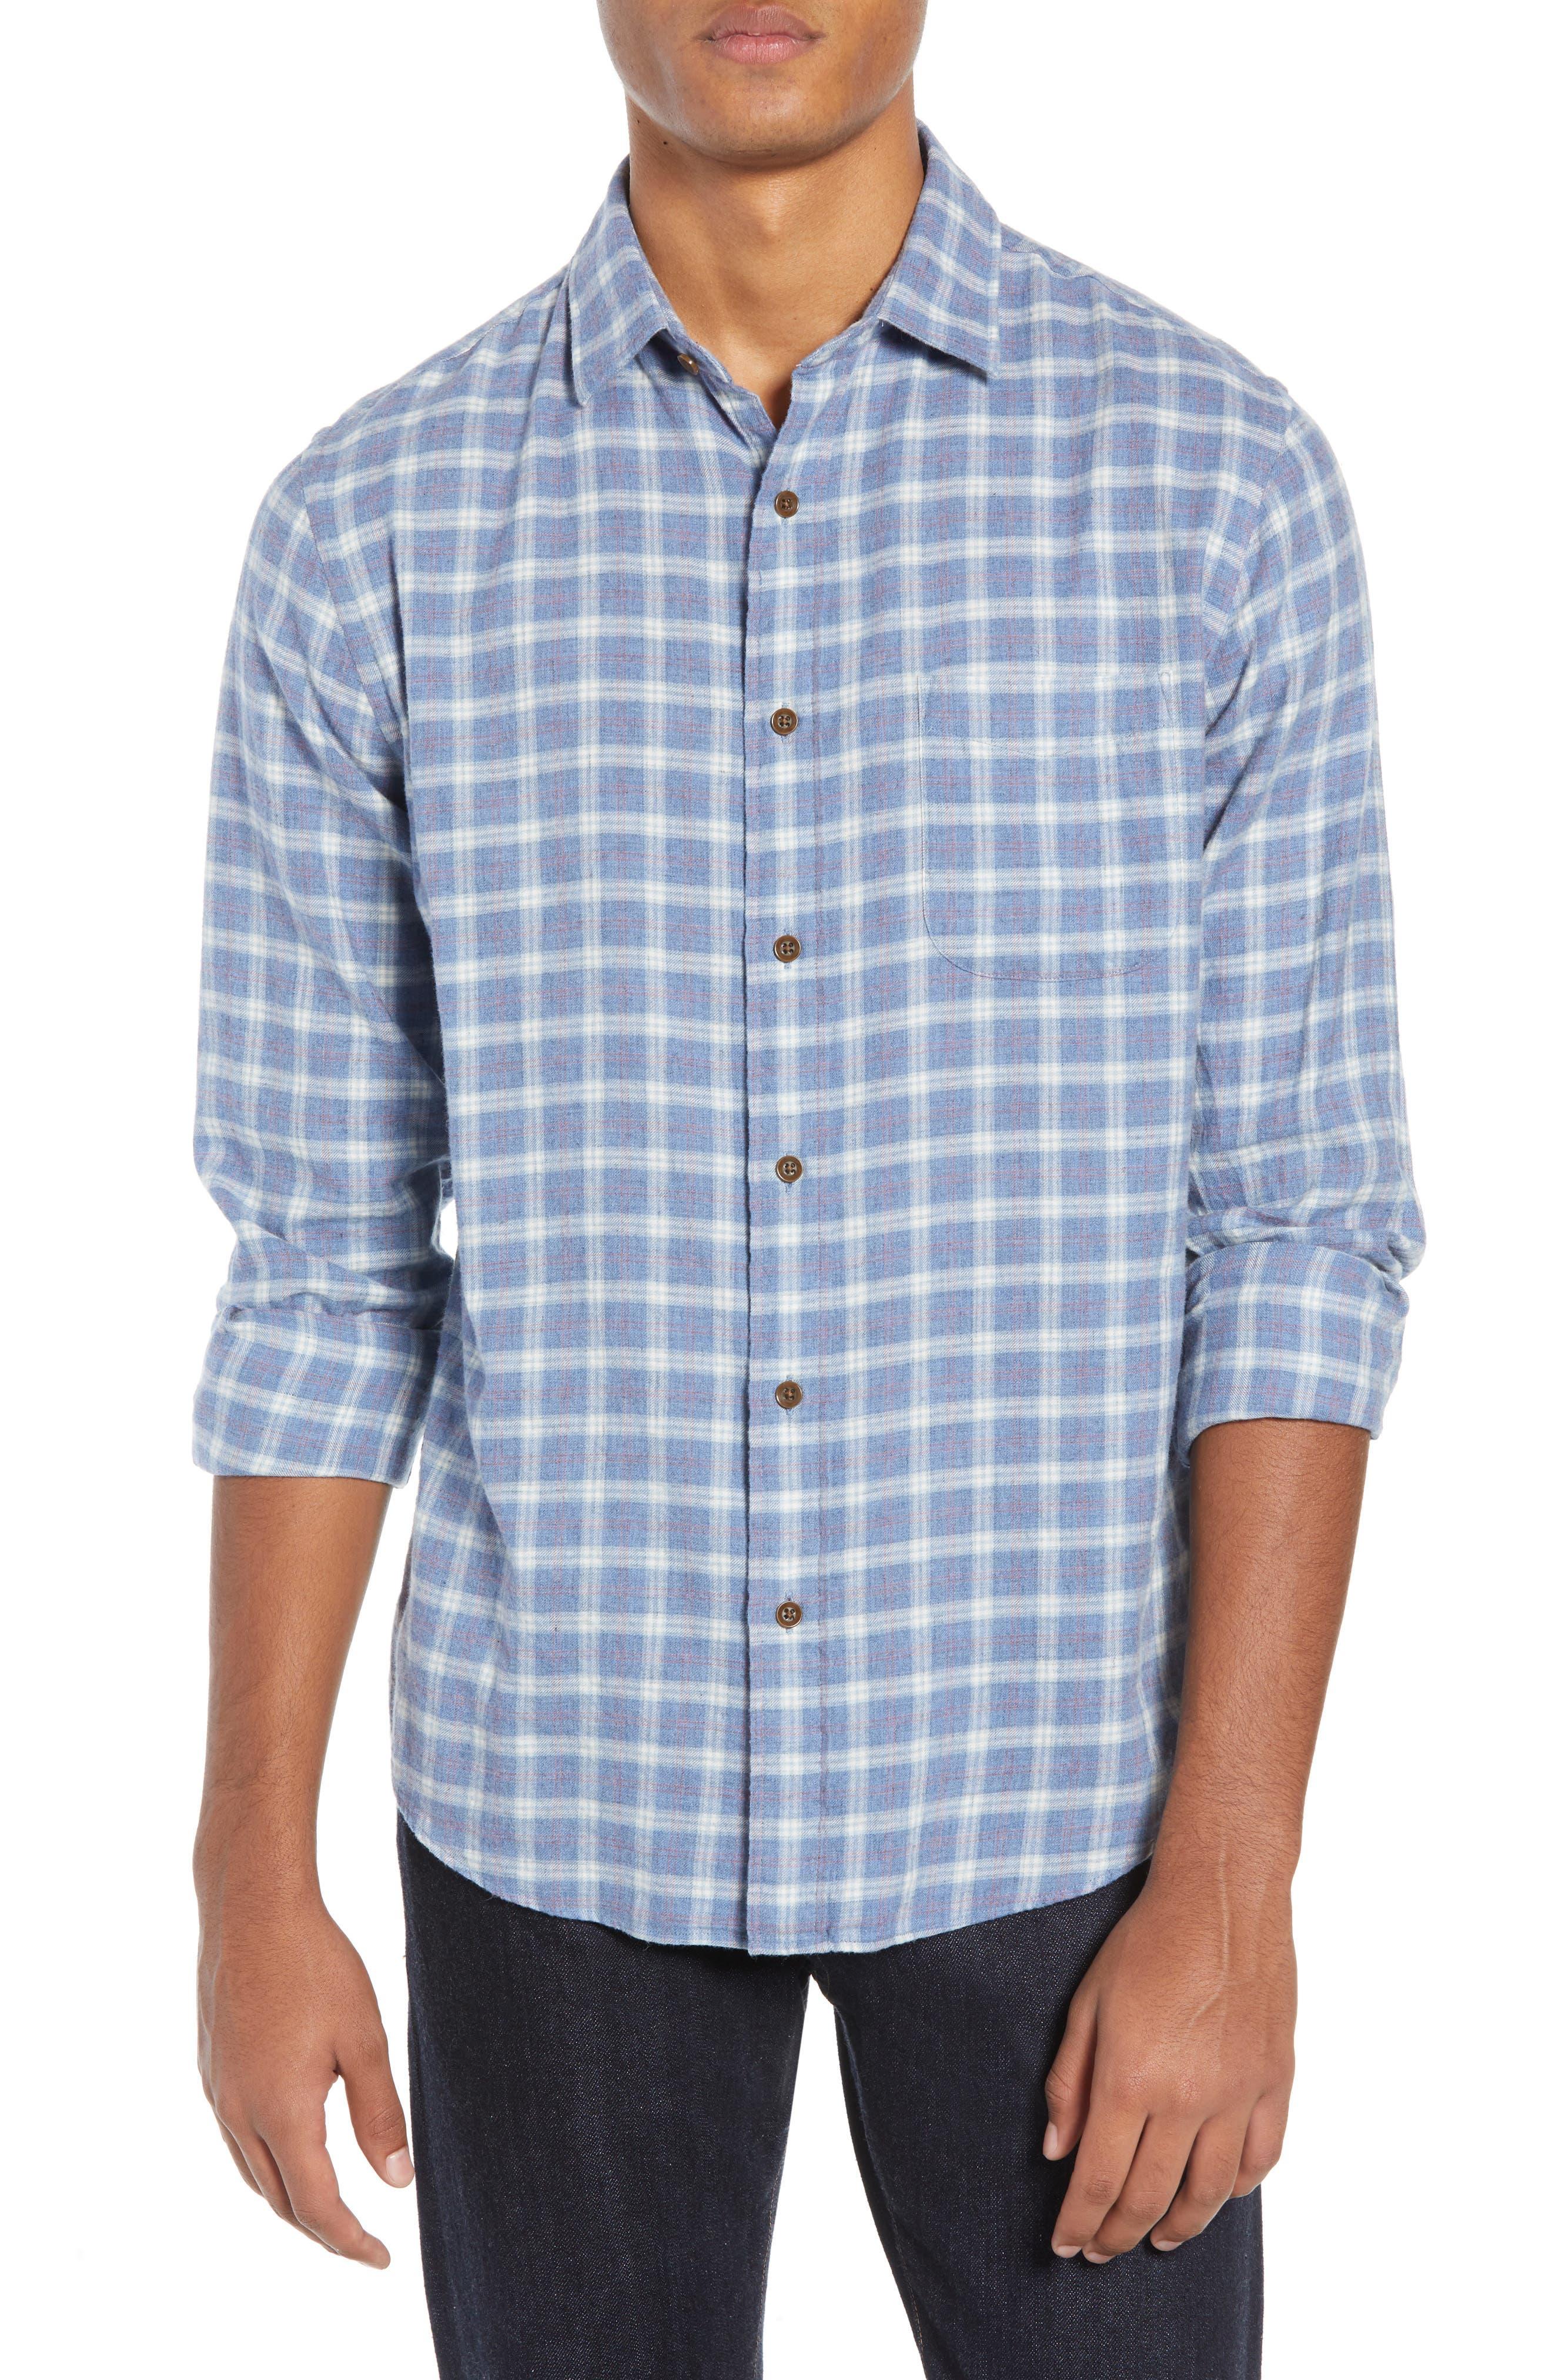 Ventura Oxford Sport Shirt,                         Main,                         color, HEATHER BLUE CHECK